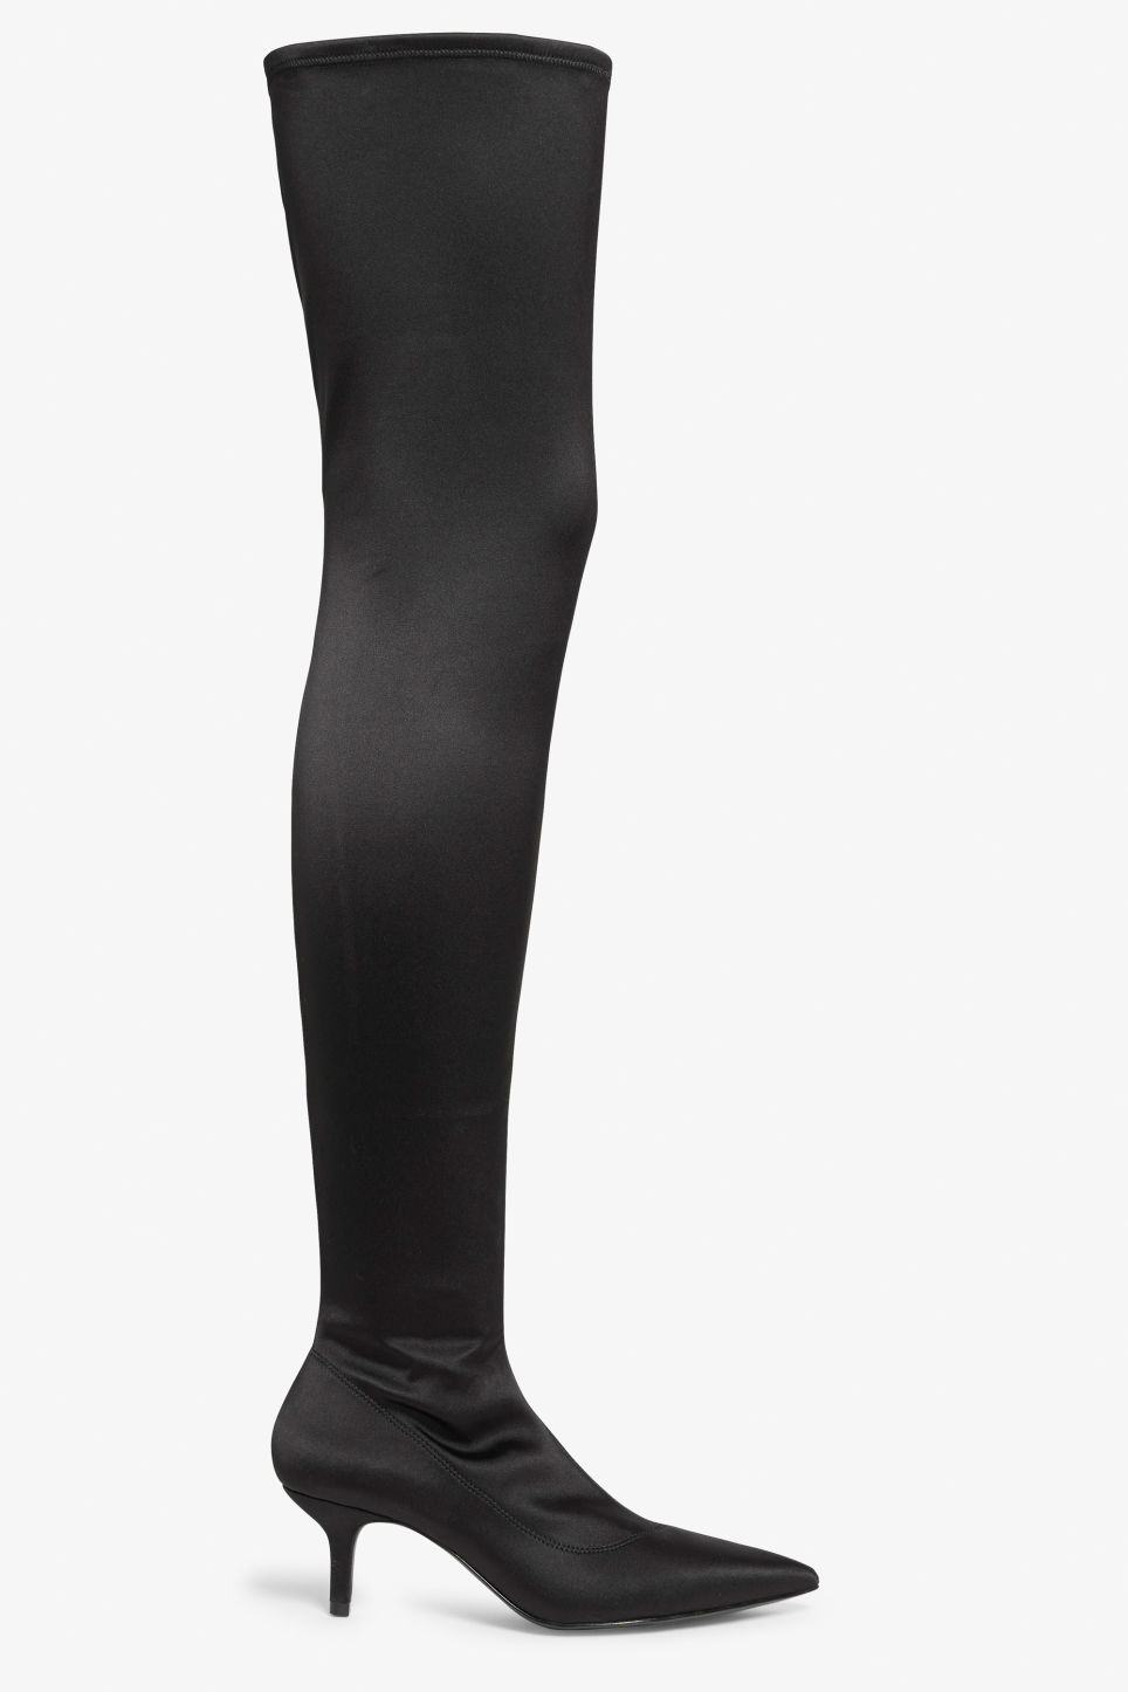 848af3d56f3 Stretch over the knee boots - Black magic - Shoes - Monki